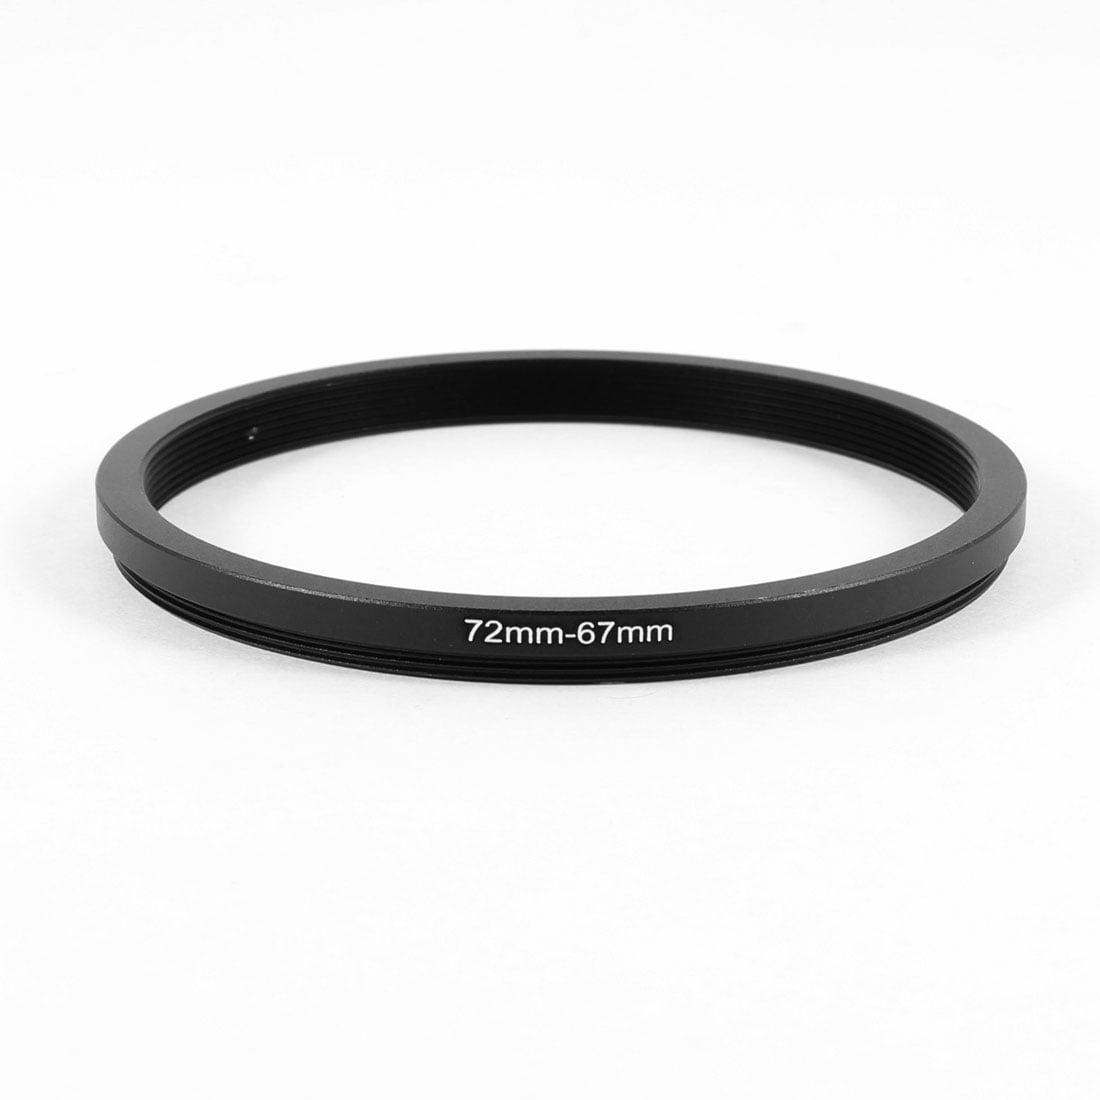 Camera Parts 72mm-67mm Lens Filter Step Down Ring Adapter Black - image 1 de 1